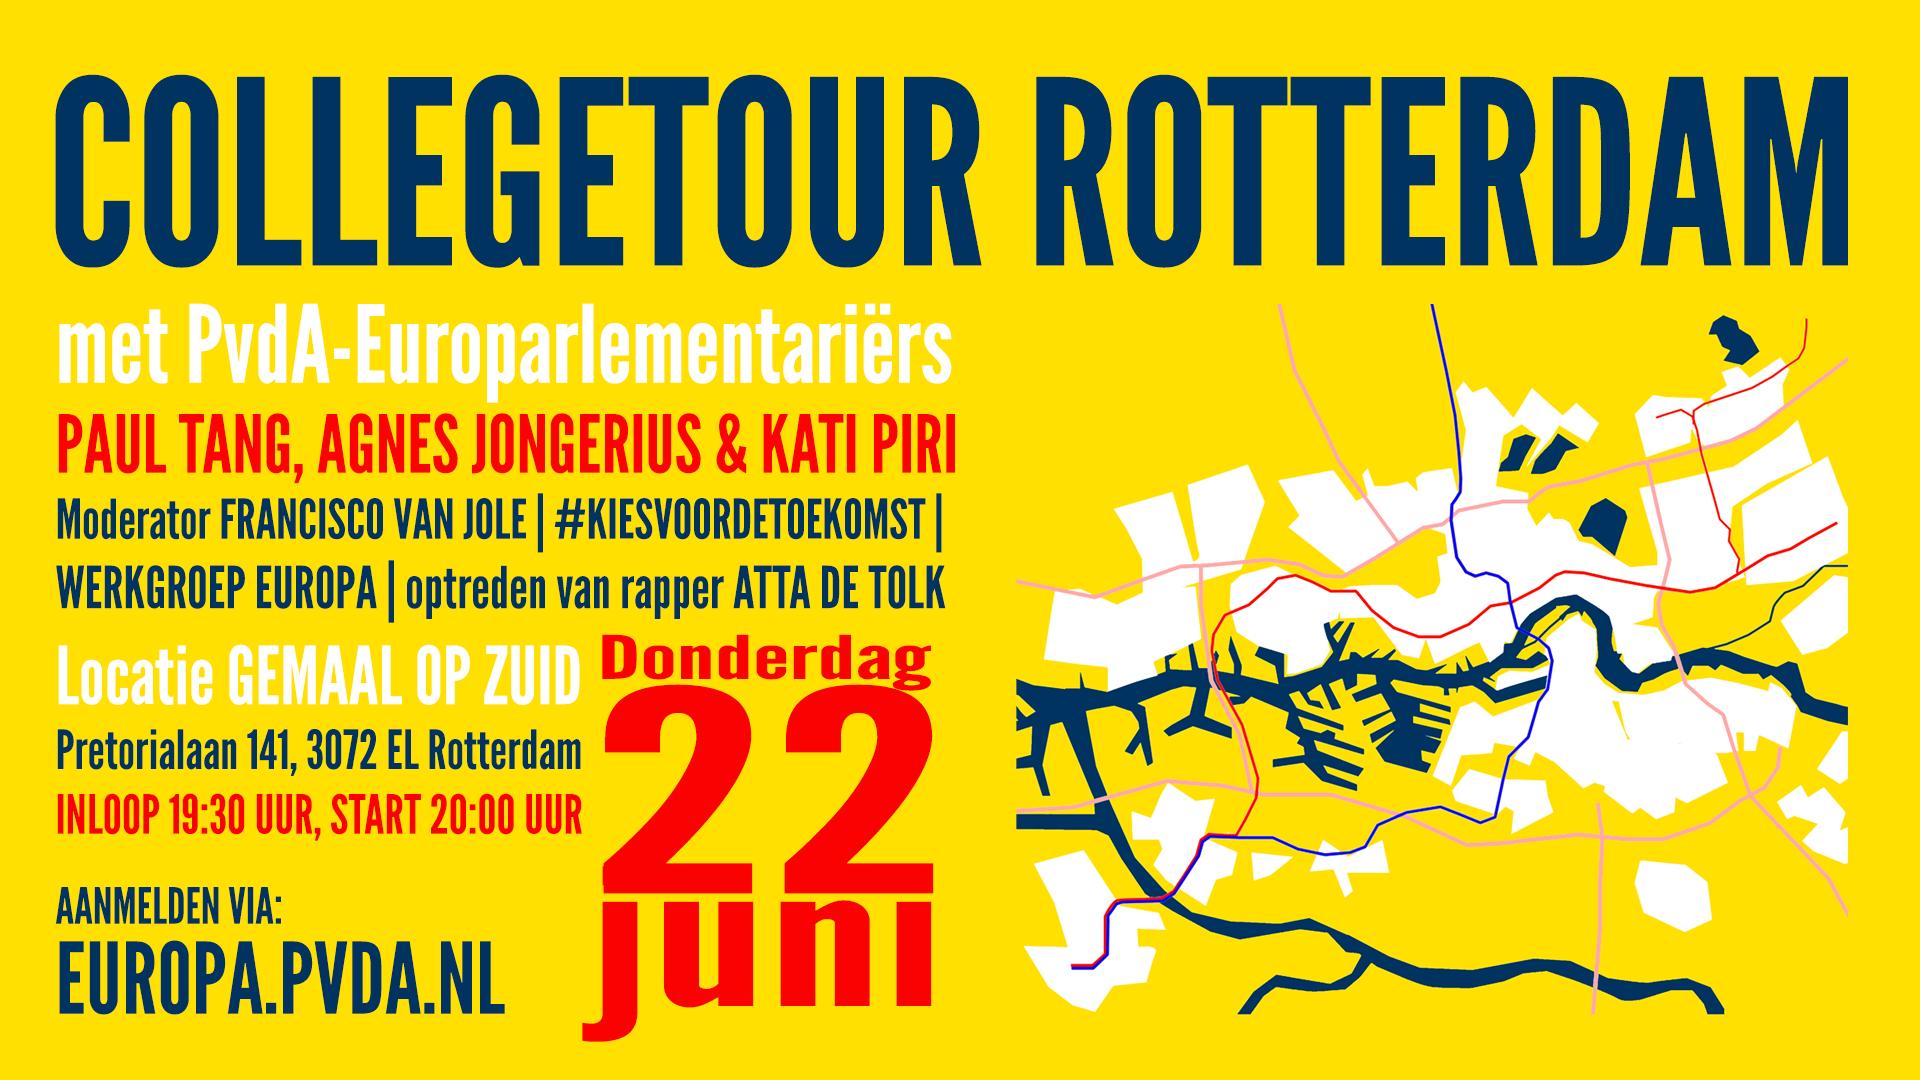 sociale media hoeren seks in Rotterdam